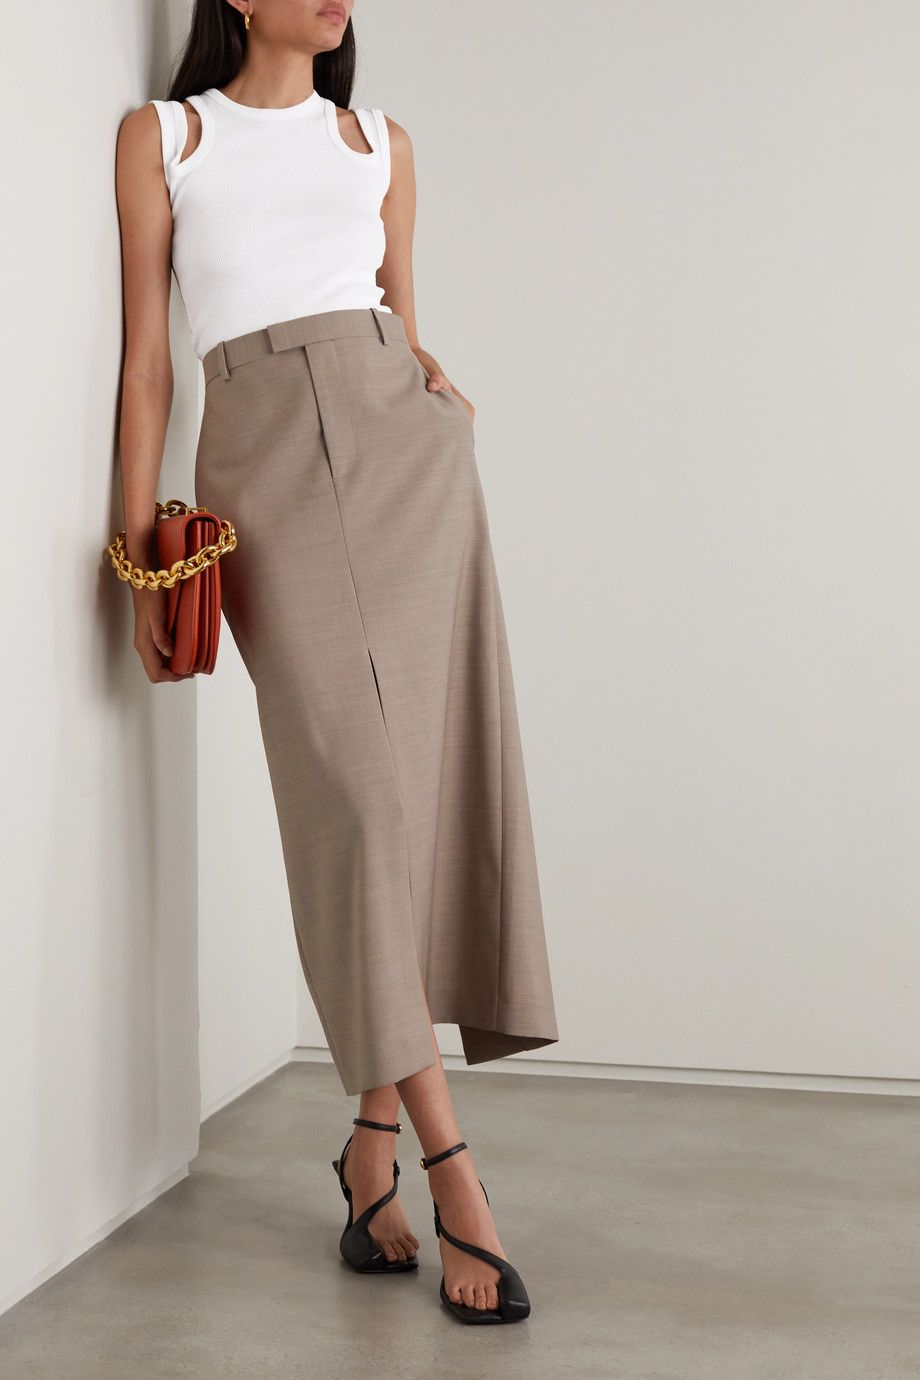 best new fashion items 286246 1629961128358